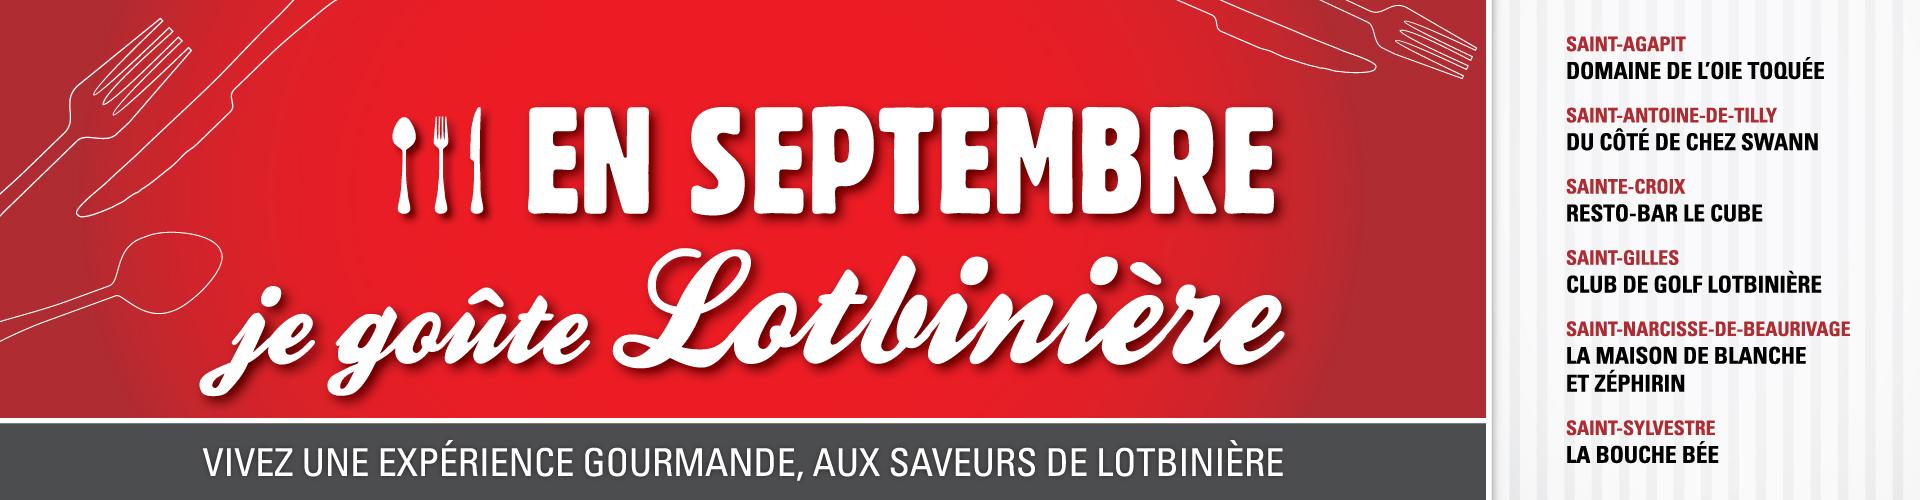 Slider_Septembre-je-goute-Lotbiniere_72dpi